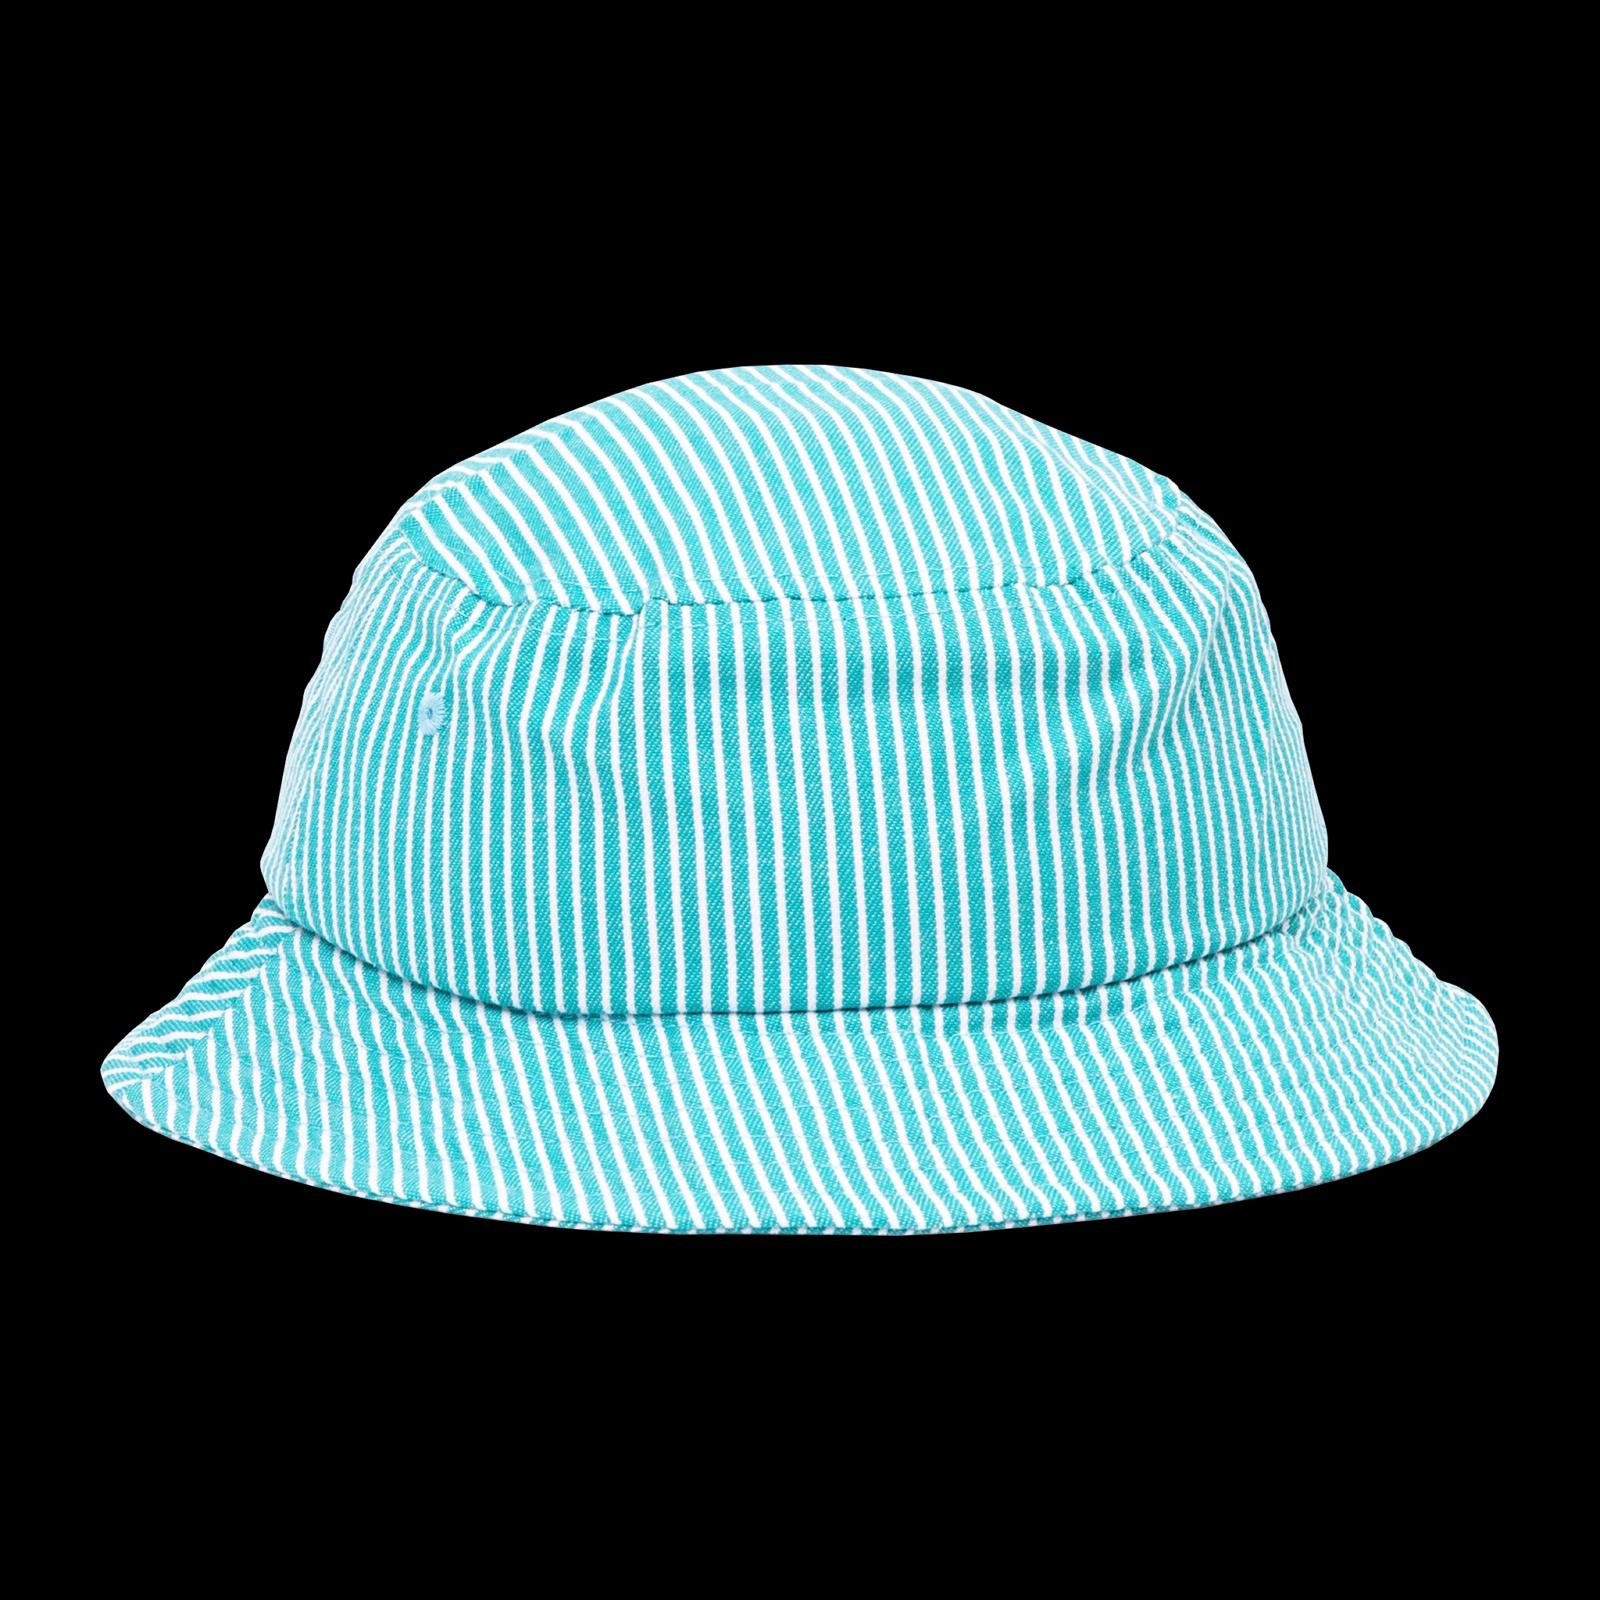 【FELT/フェルト】SCULPTOR BUCKET HAT バケットハット / TEAL